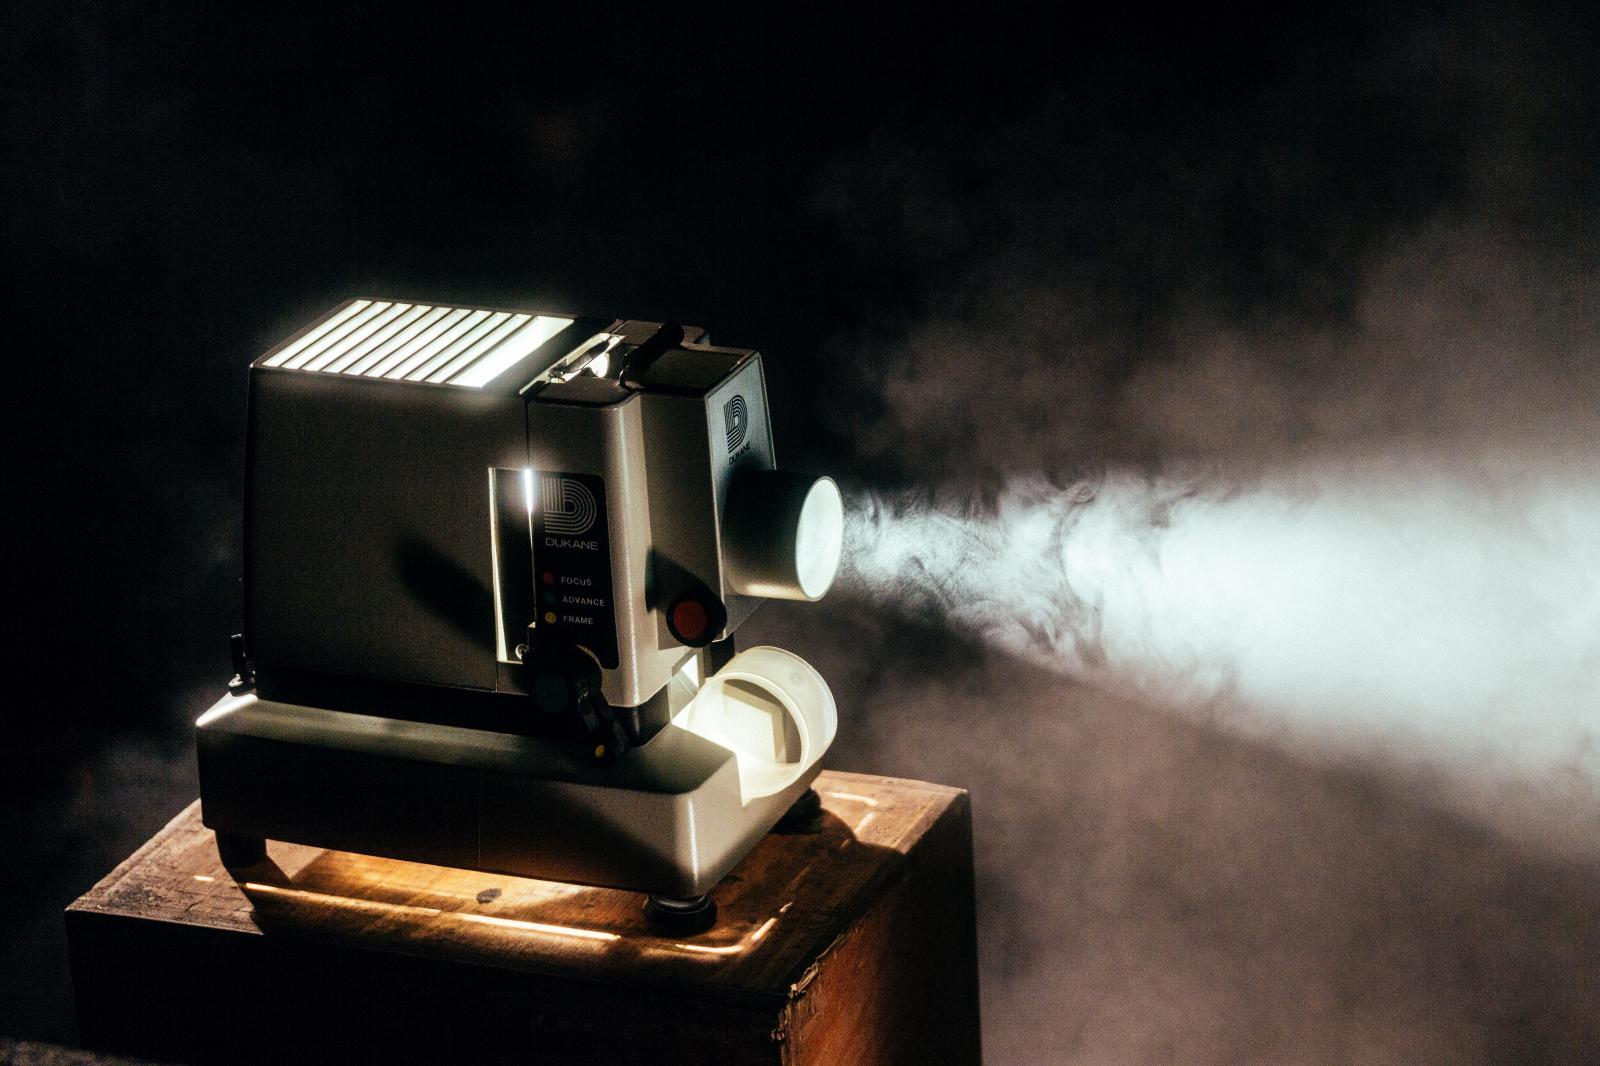 Photography image - Loading jeremy-yap-J39X2xX_8CQ-unsplash_film_projector.jpg